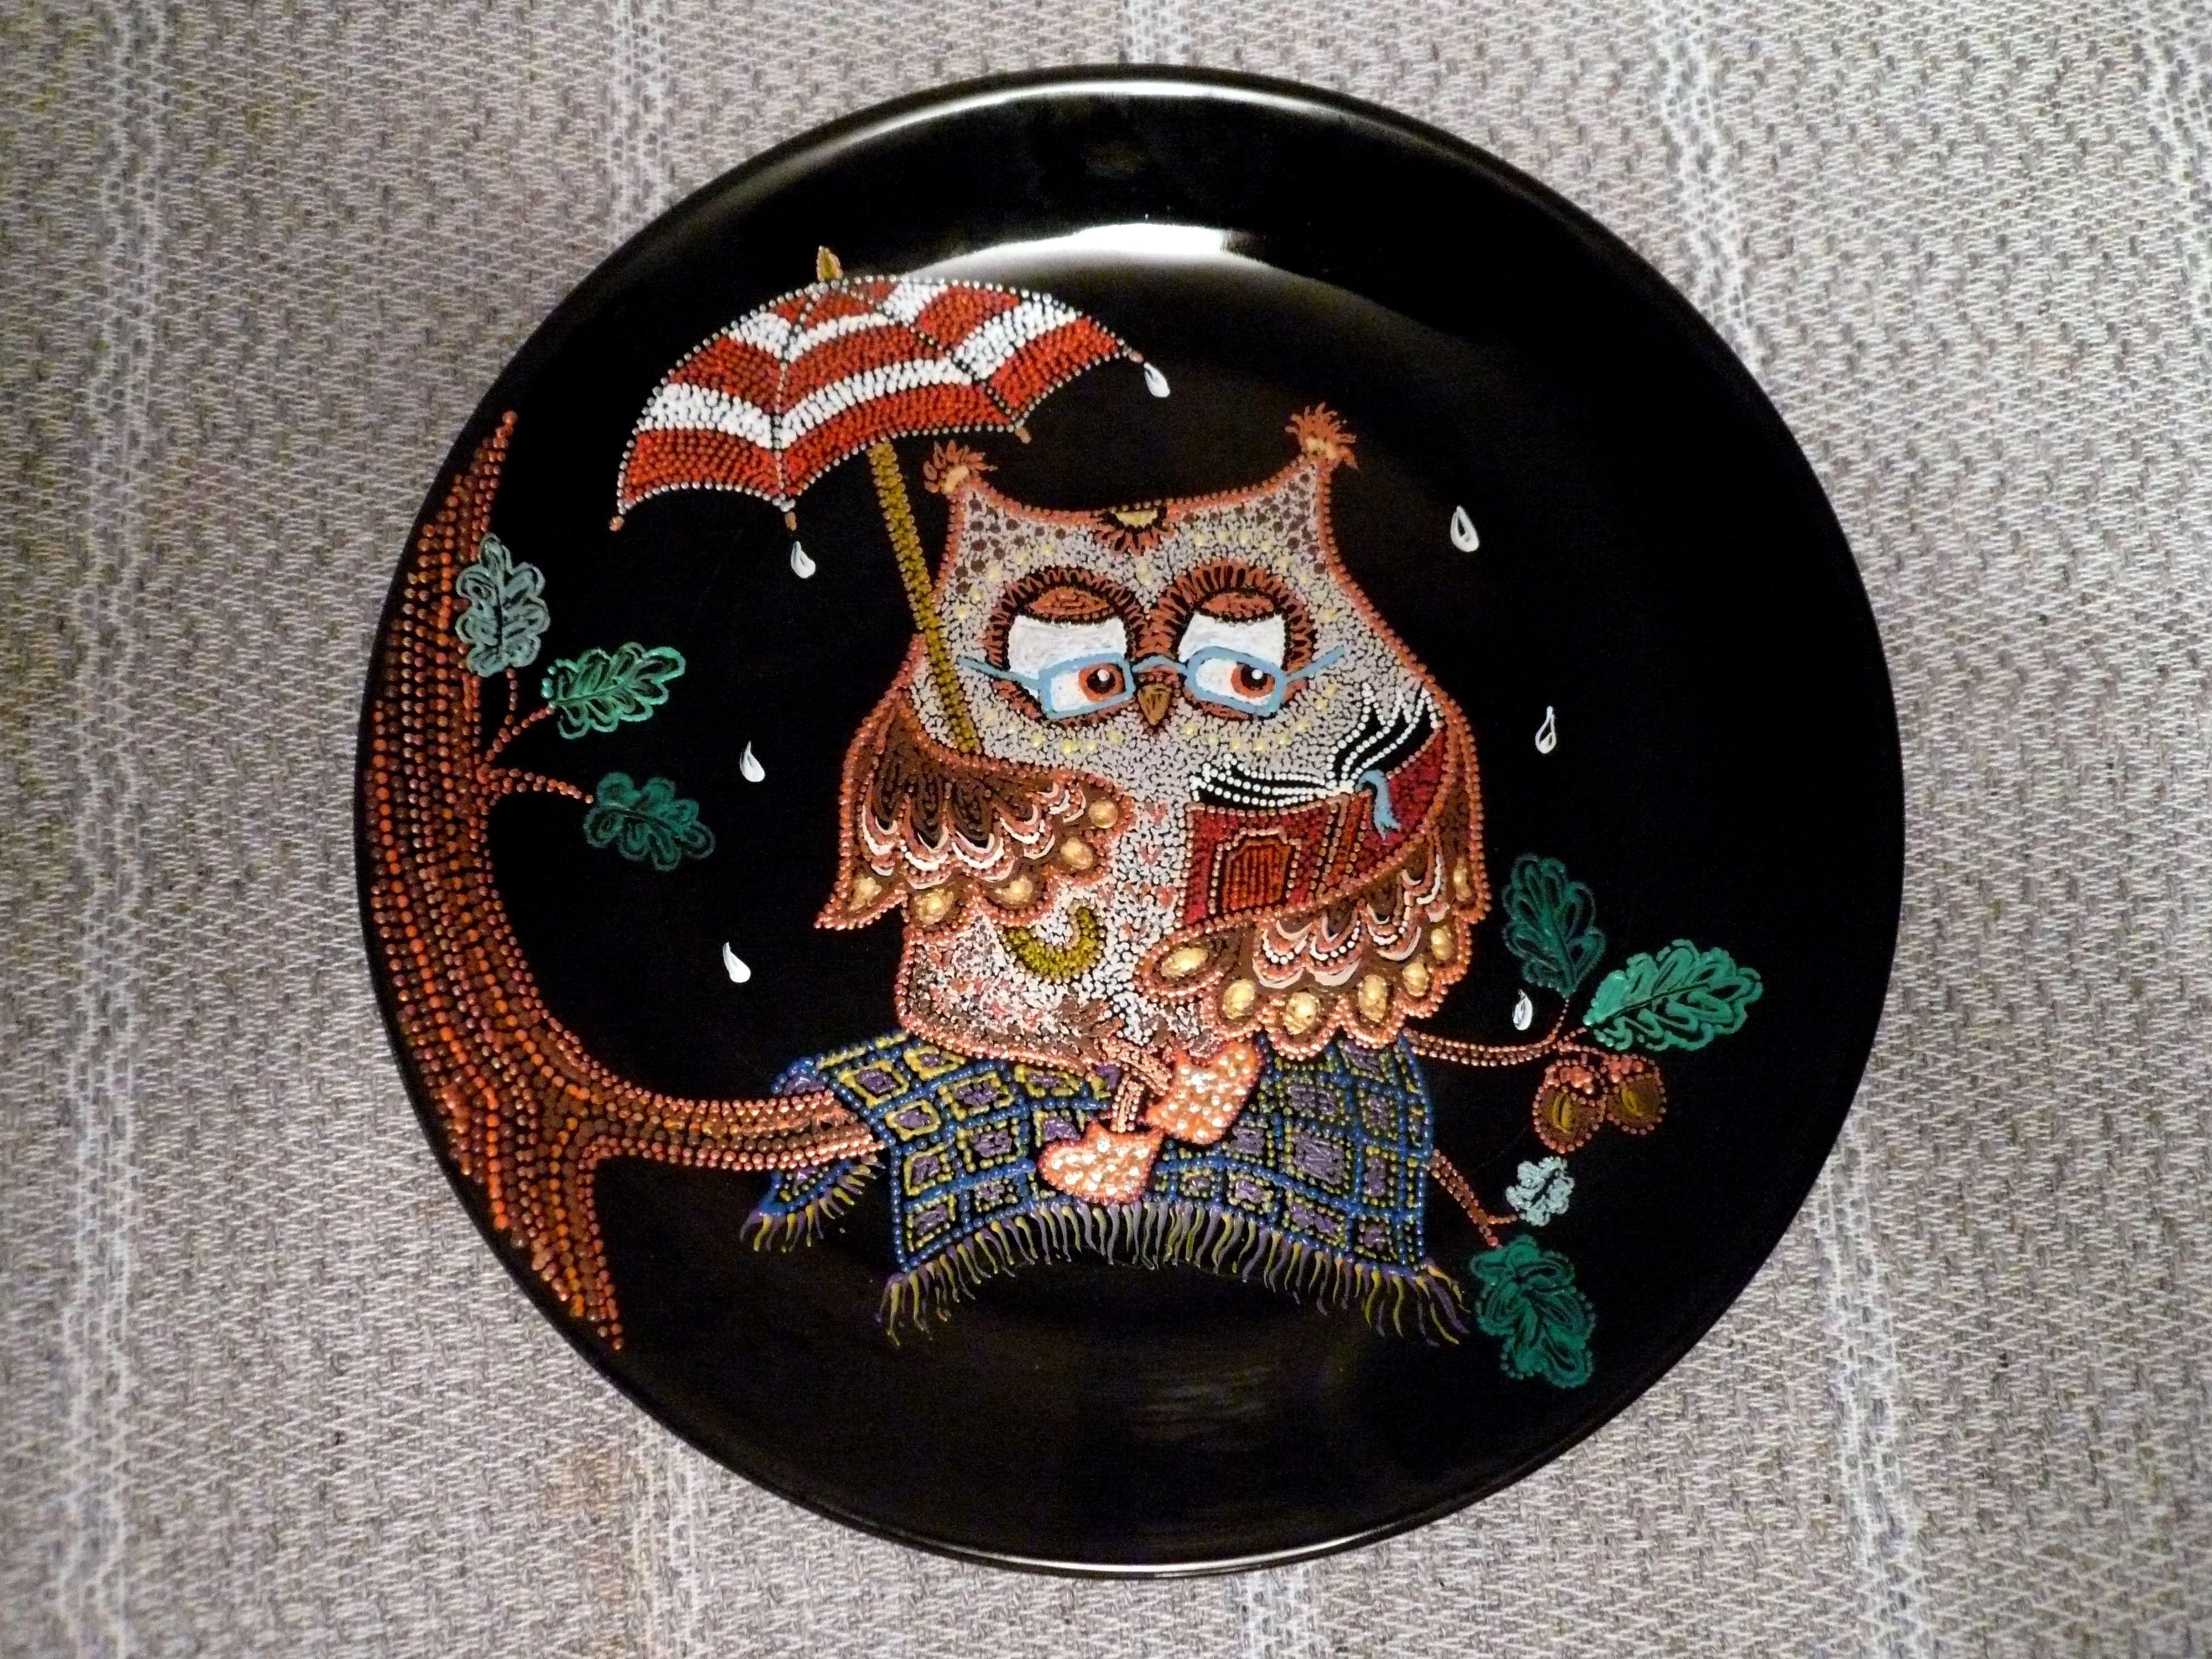 сказка декоративнаятарелка тарелка точечнаяроспись handmade декор сова ручнаяработа птицы подарок